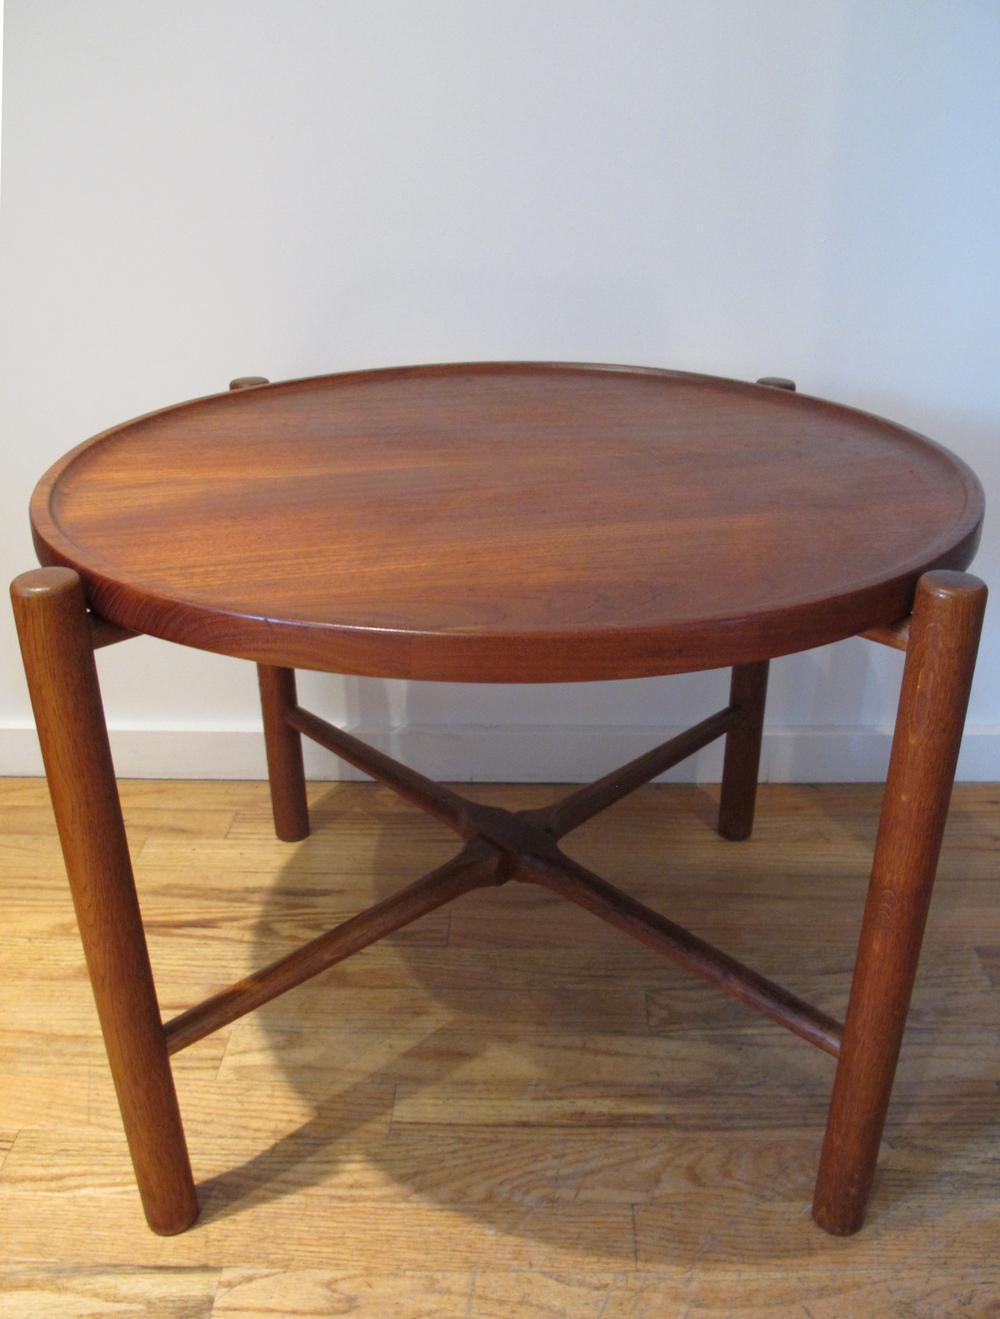 DANISH HANS WEGNER FOR ANDREAS TUCK FOLDING TEAK TRAY TABLE